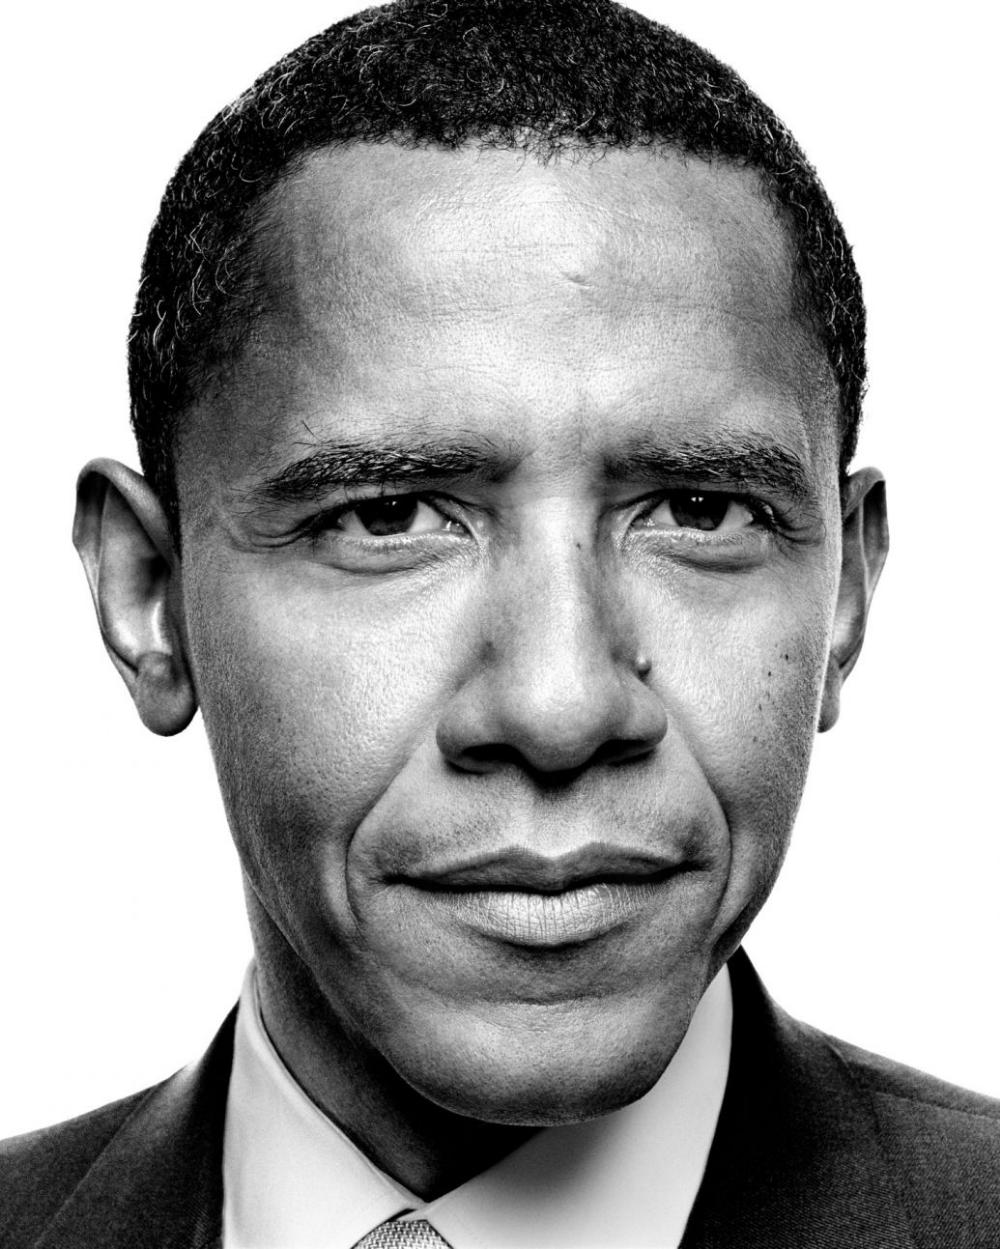 Platon In 2020 Portrait Black And White Portraits Portrait Photography